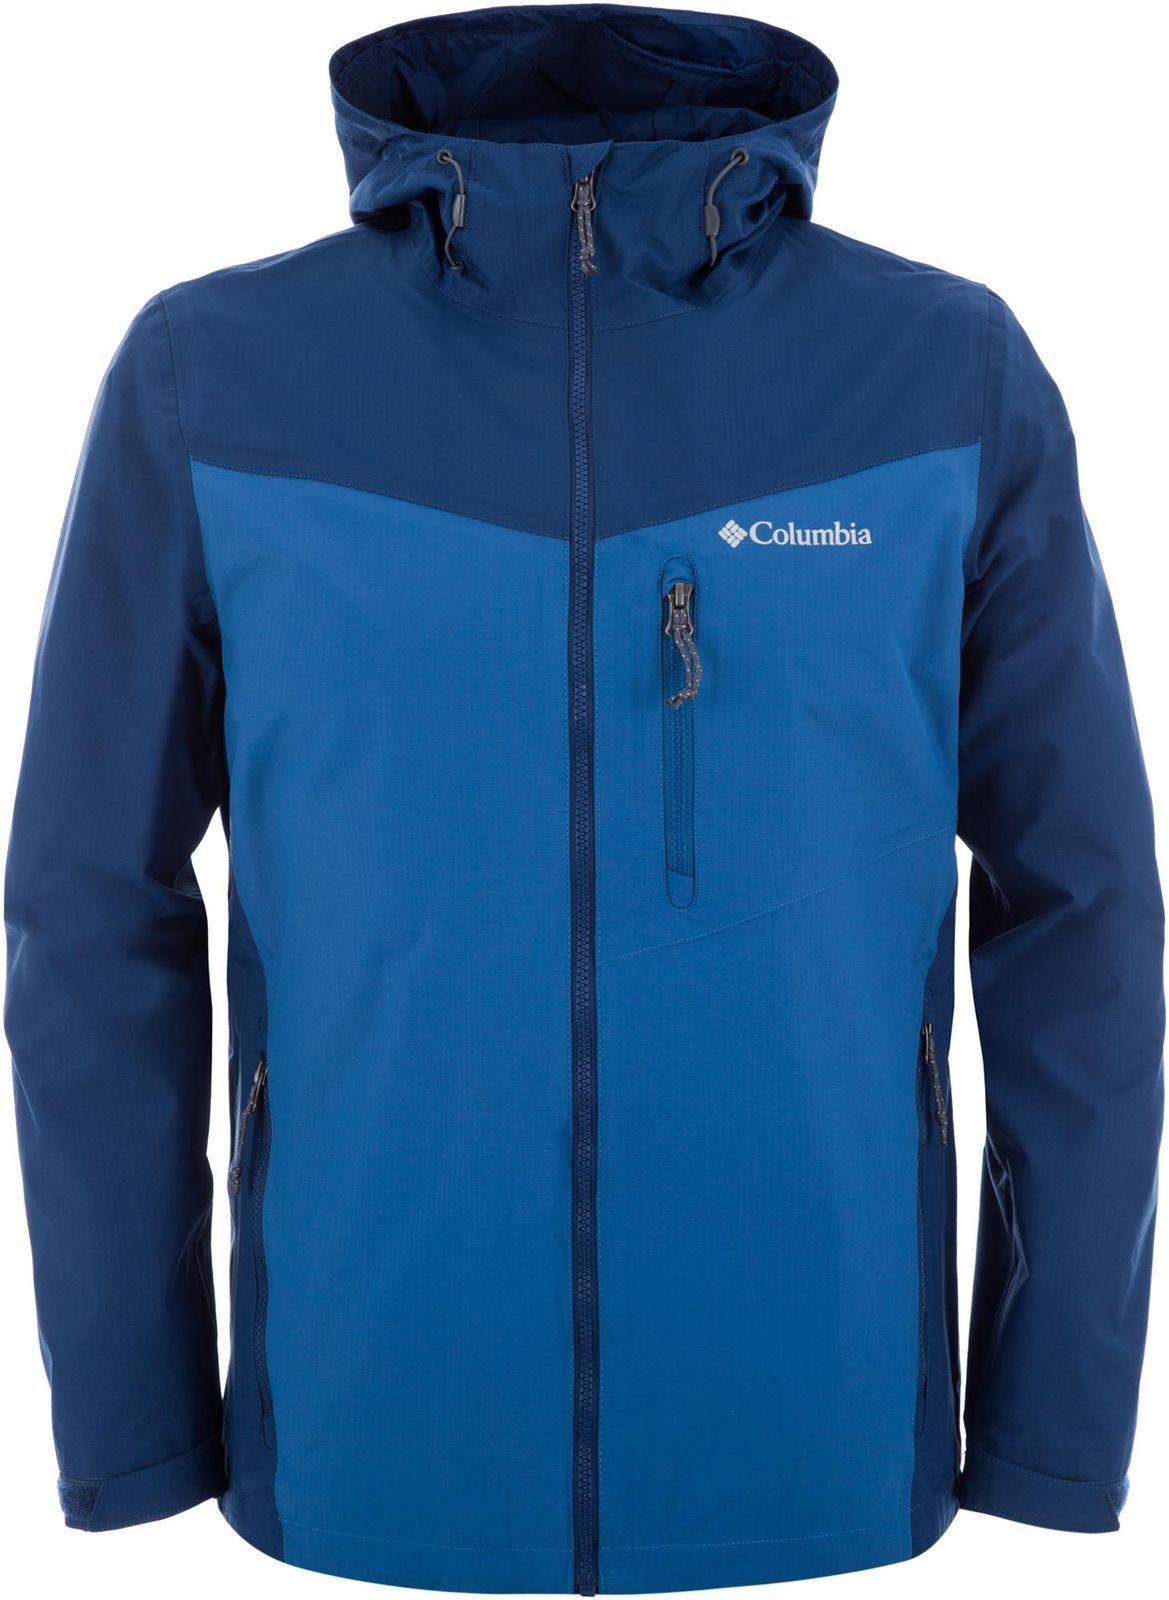 Ветровка Columbia Western Barlow II Jacket